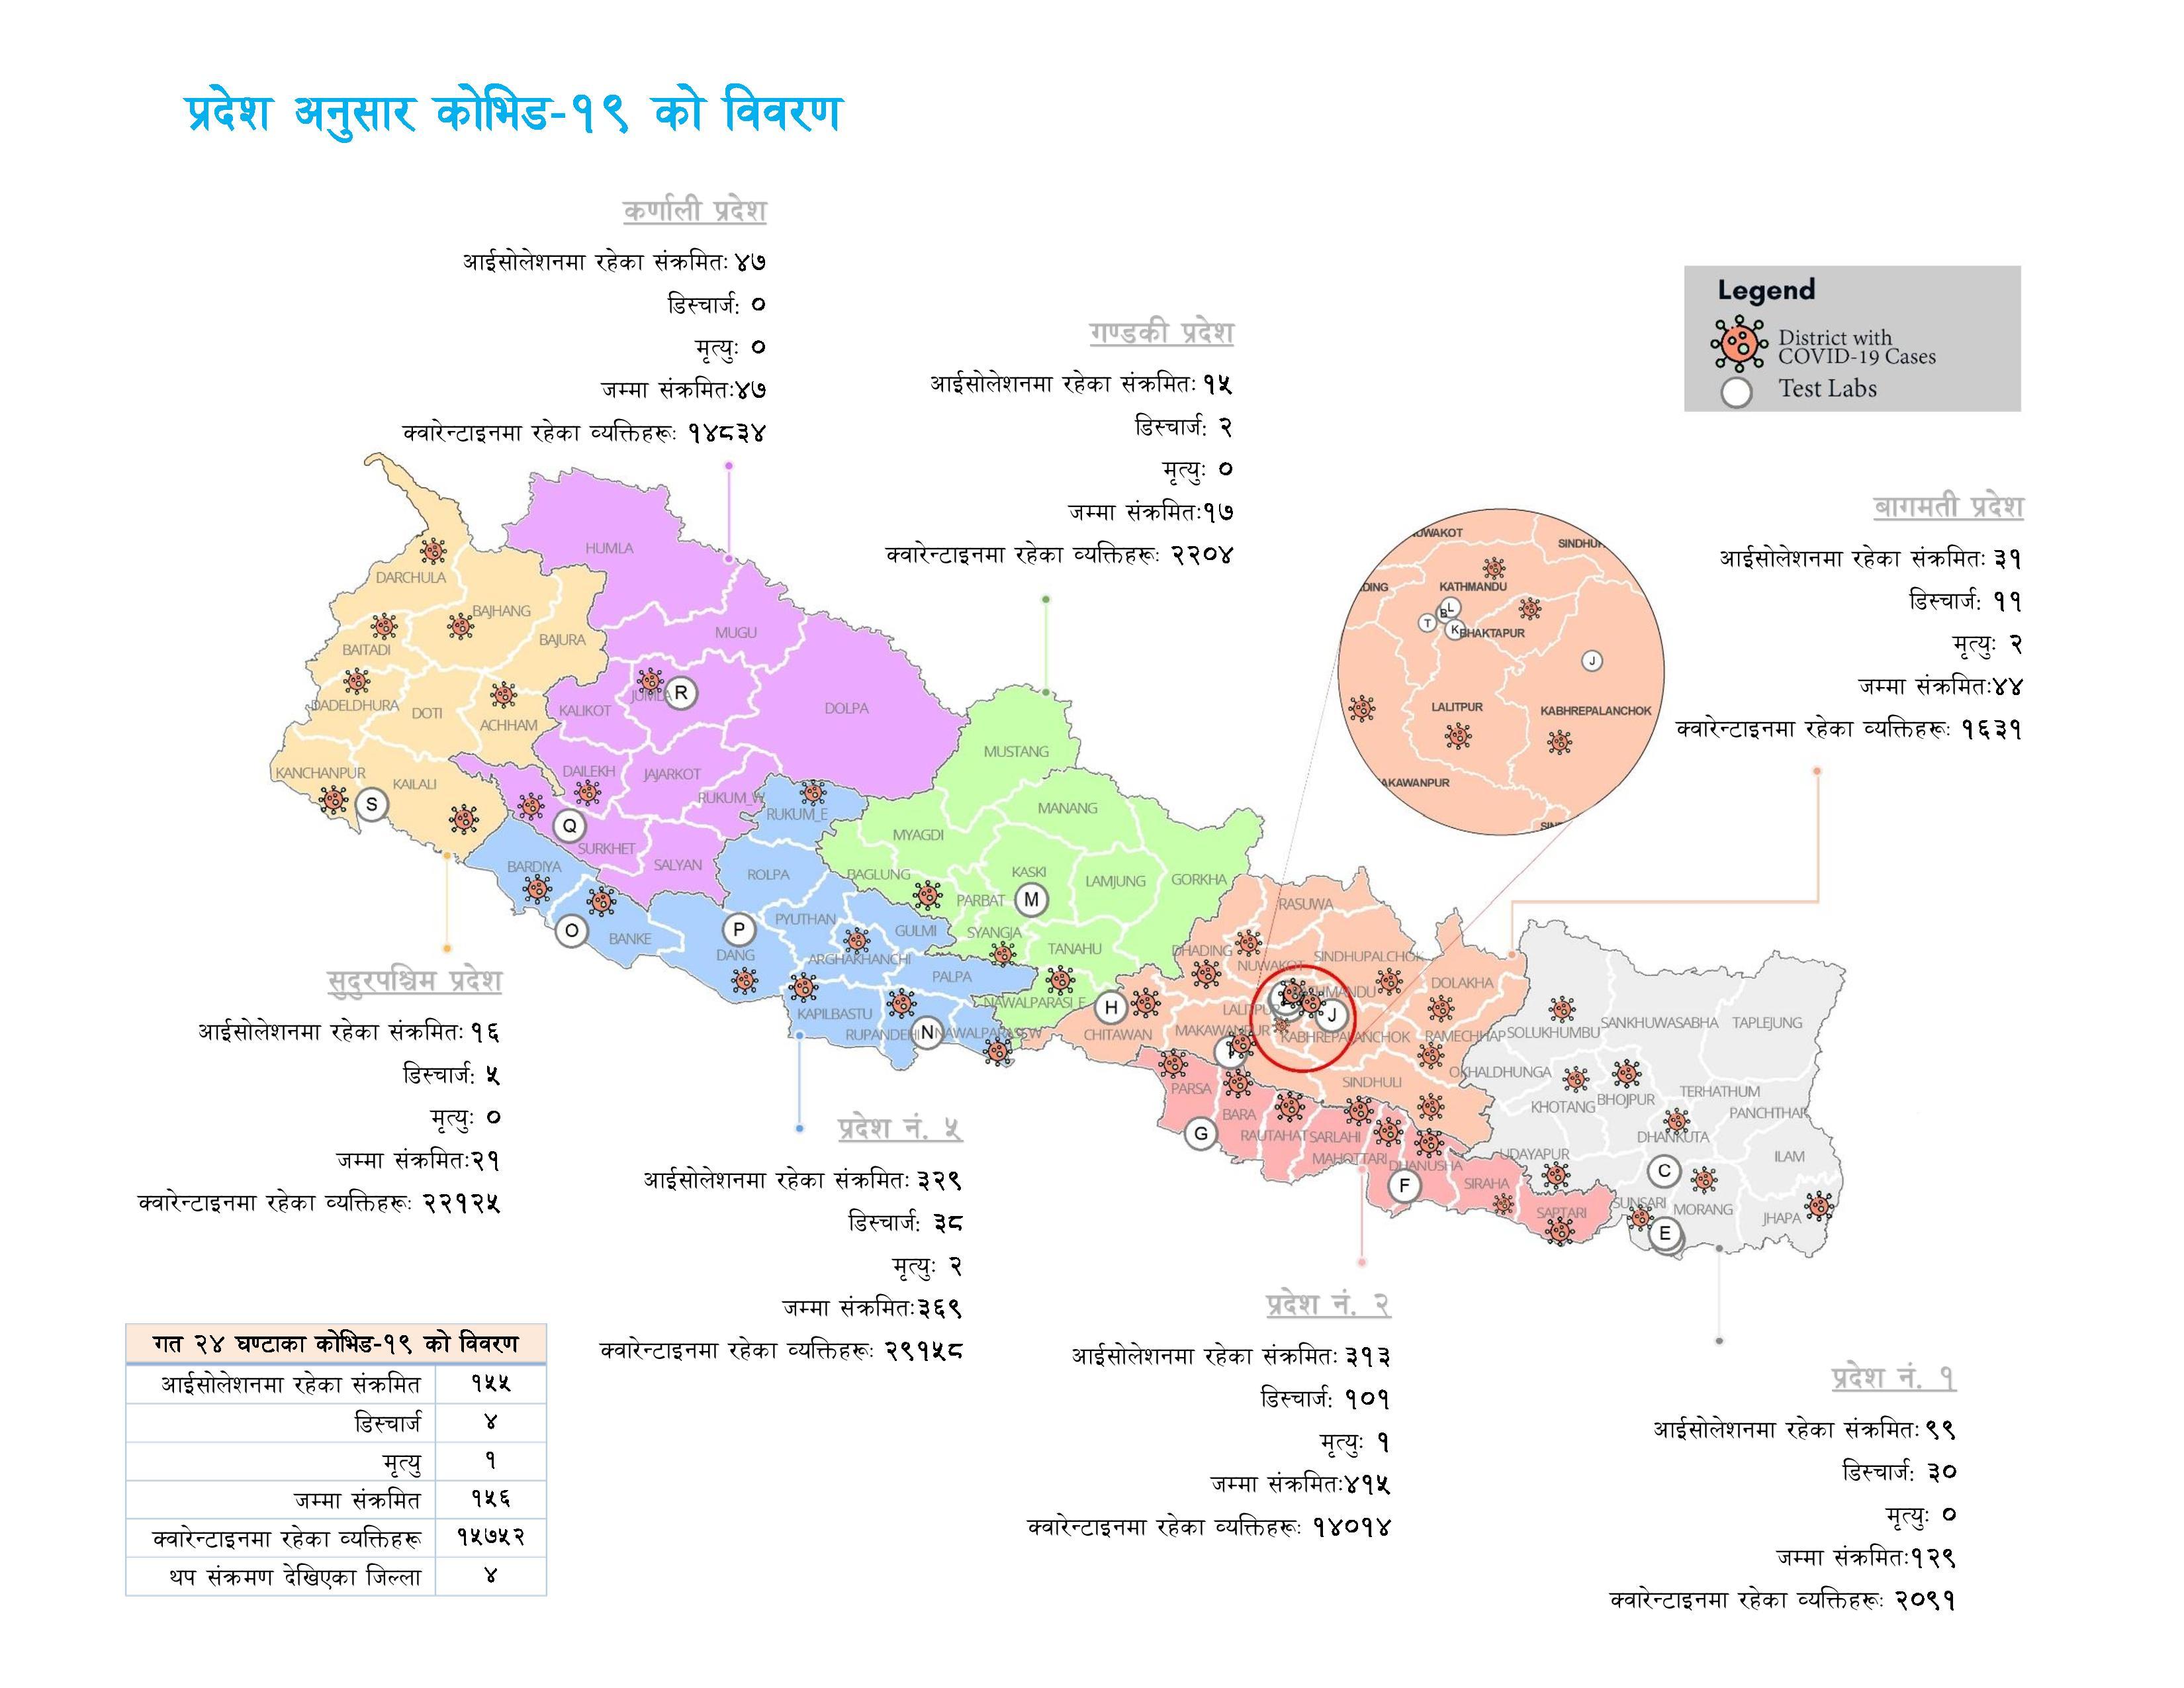 Nepal province-wise COVID-19 Status